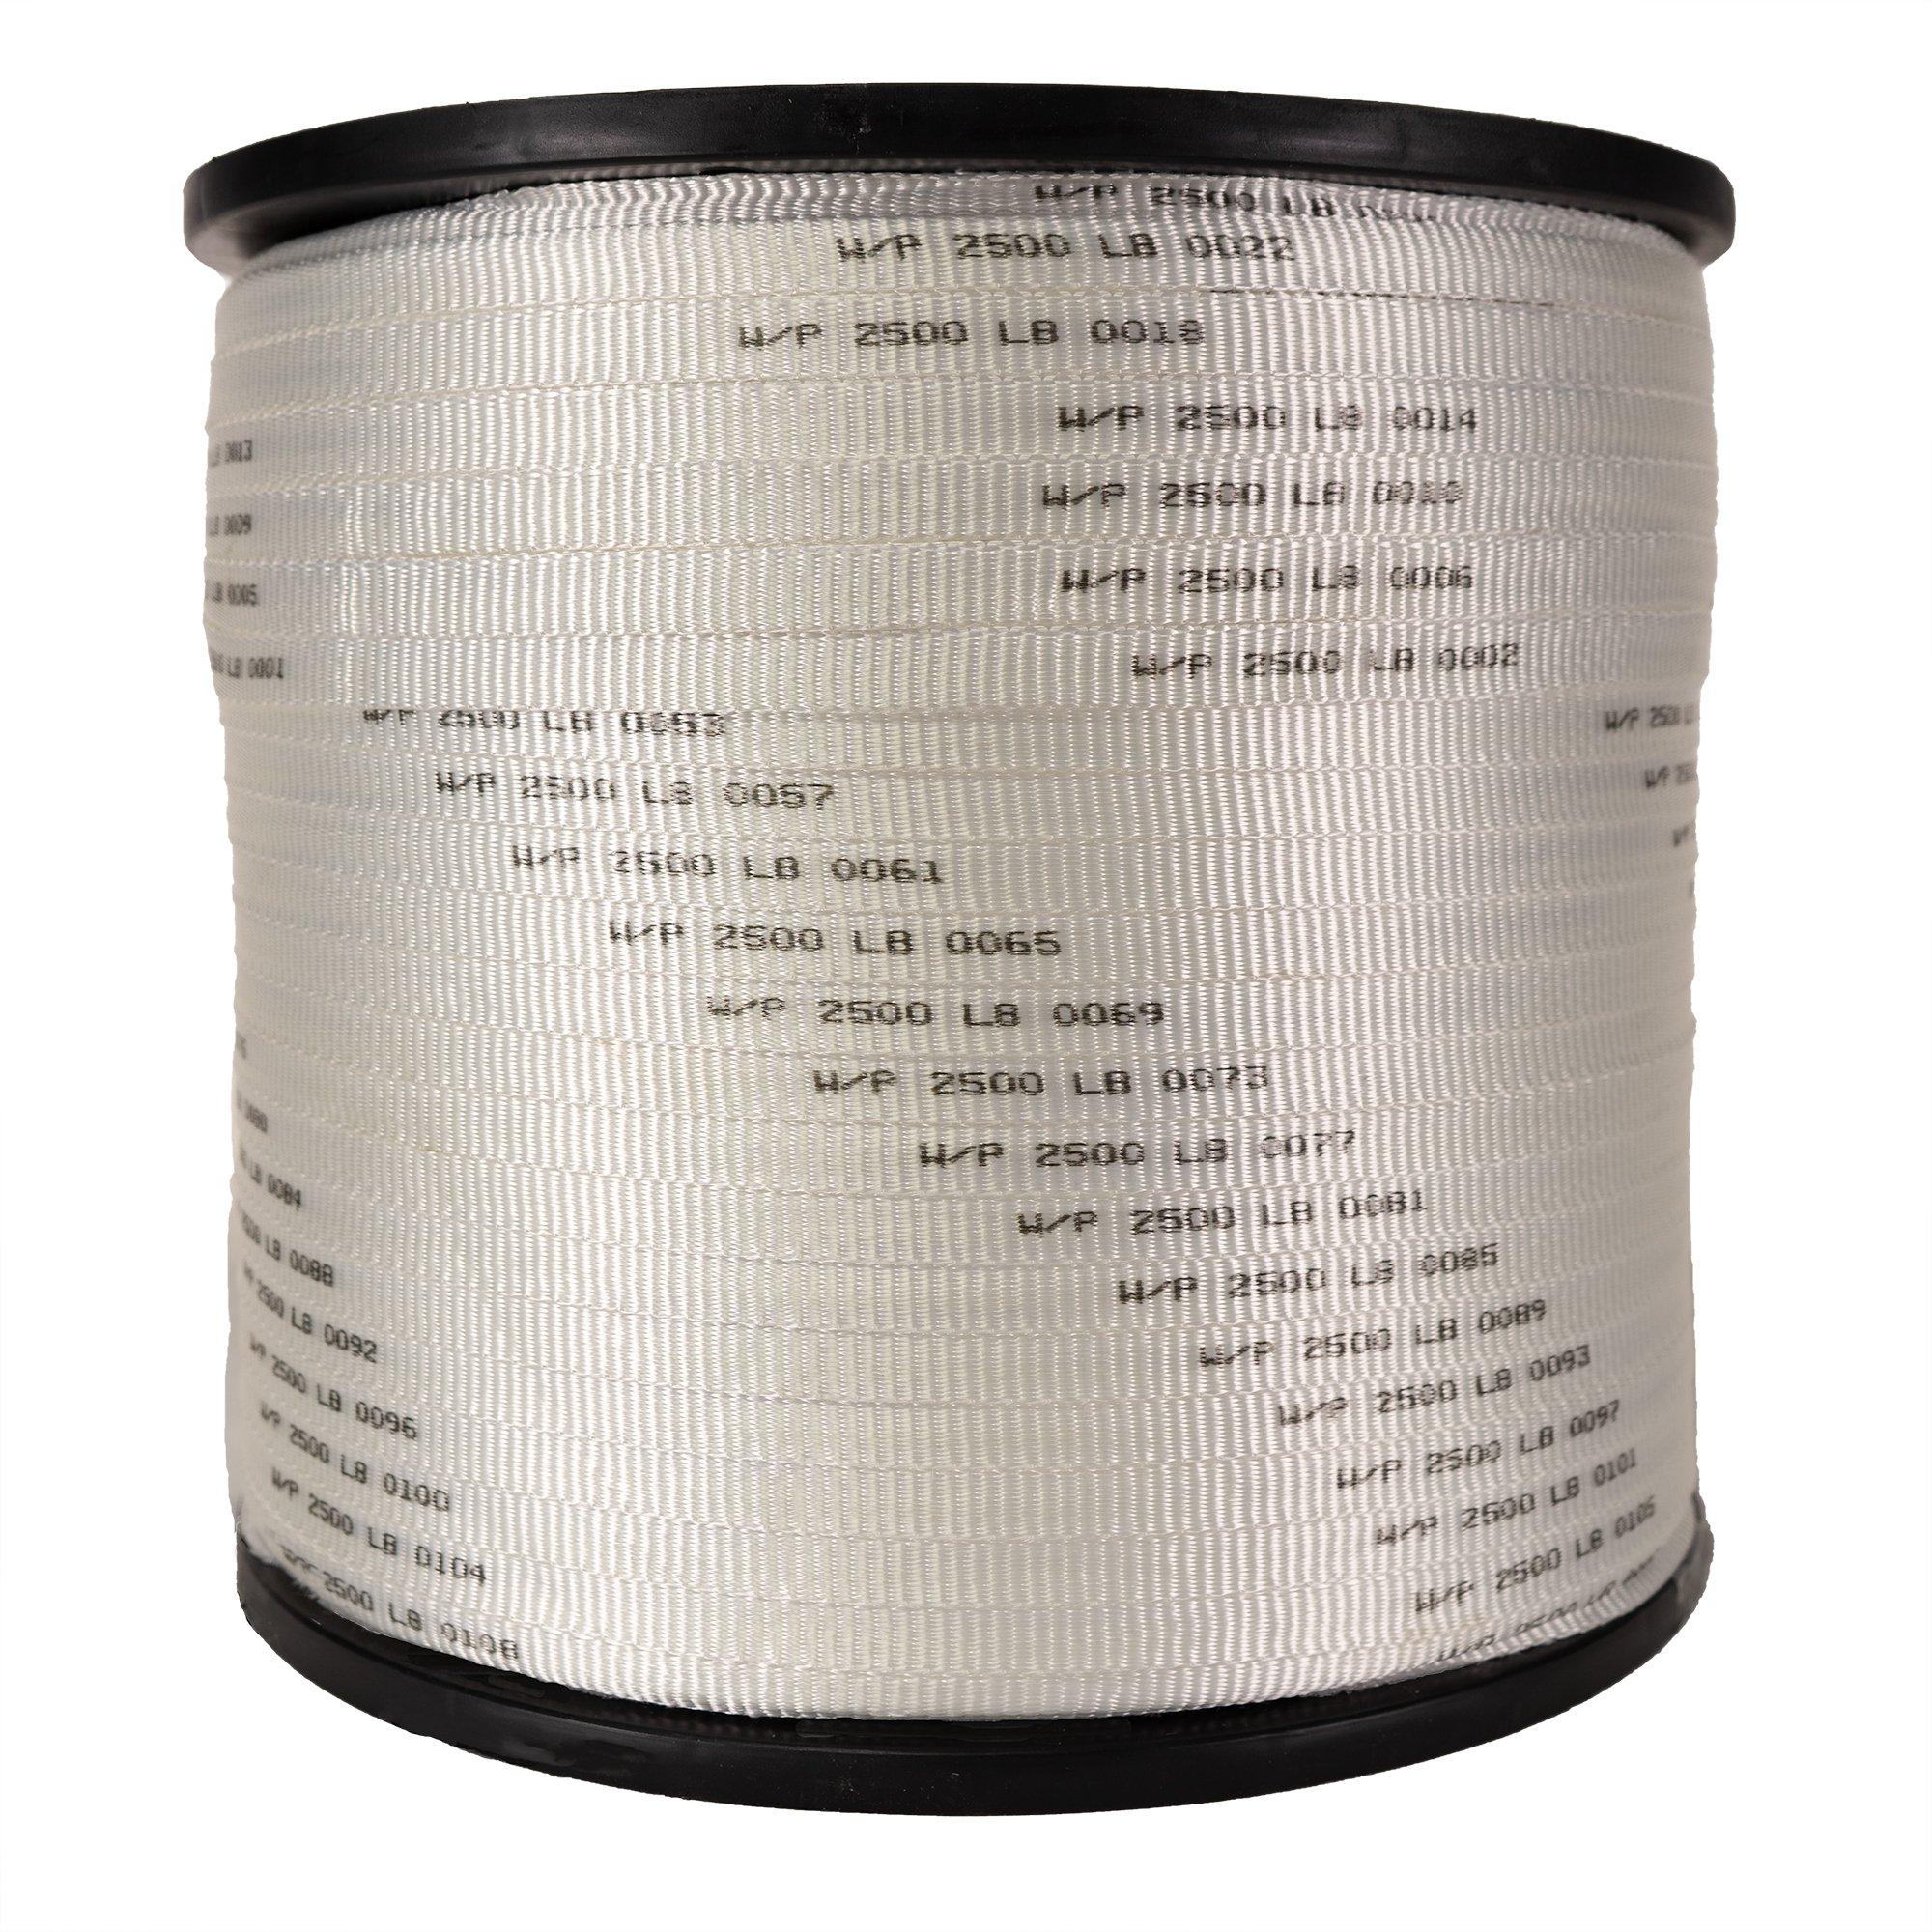 2500 lb 3/4 inch pull tape